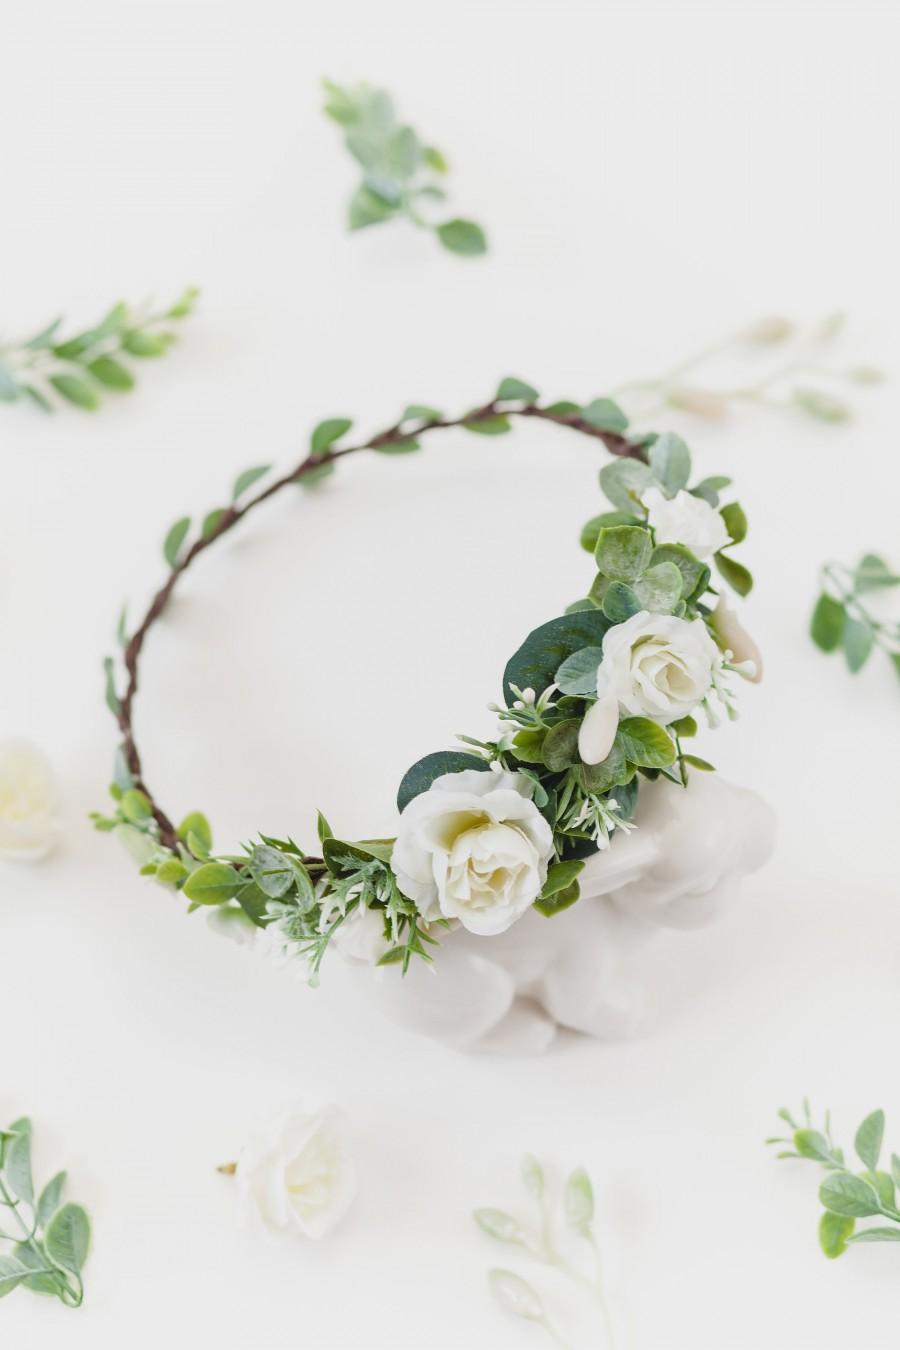 Mariage - Fall Headpiece Flower Crown Greenery Hair Accessory Wedding Hair Piece Woodland Hair Crown Rustic Wreath Bridal Floral Crown Wedding